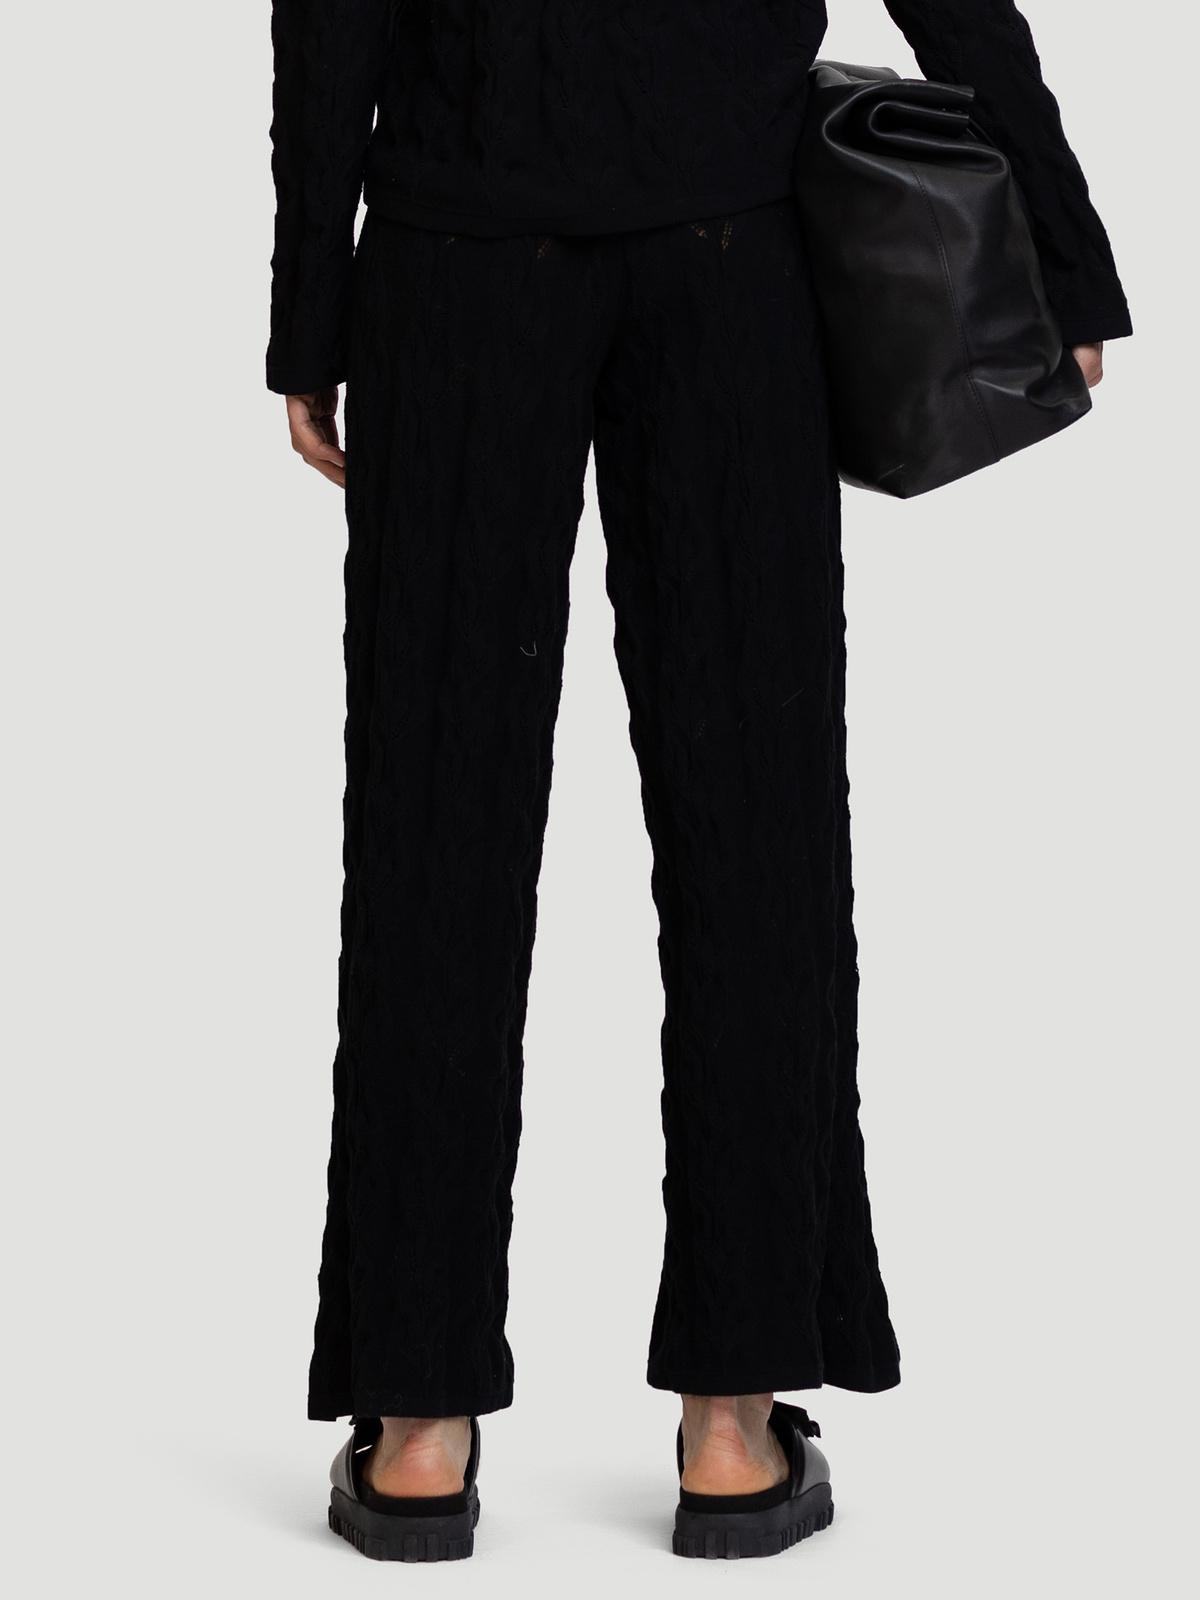 Thiril Knit Trouser Black 4